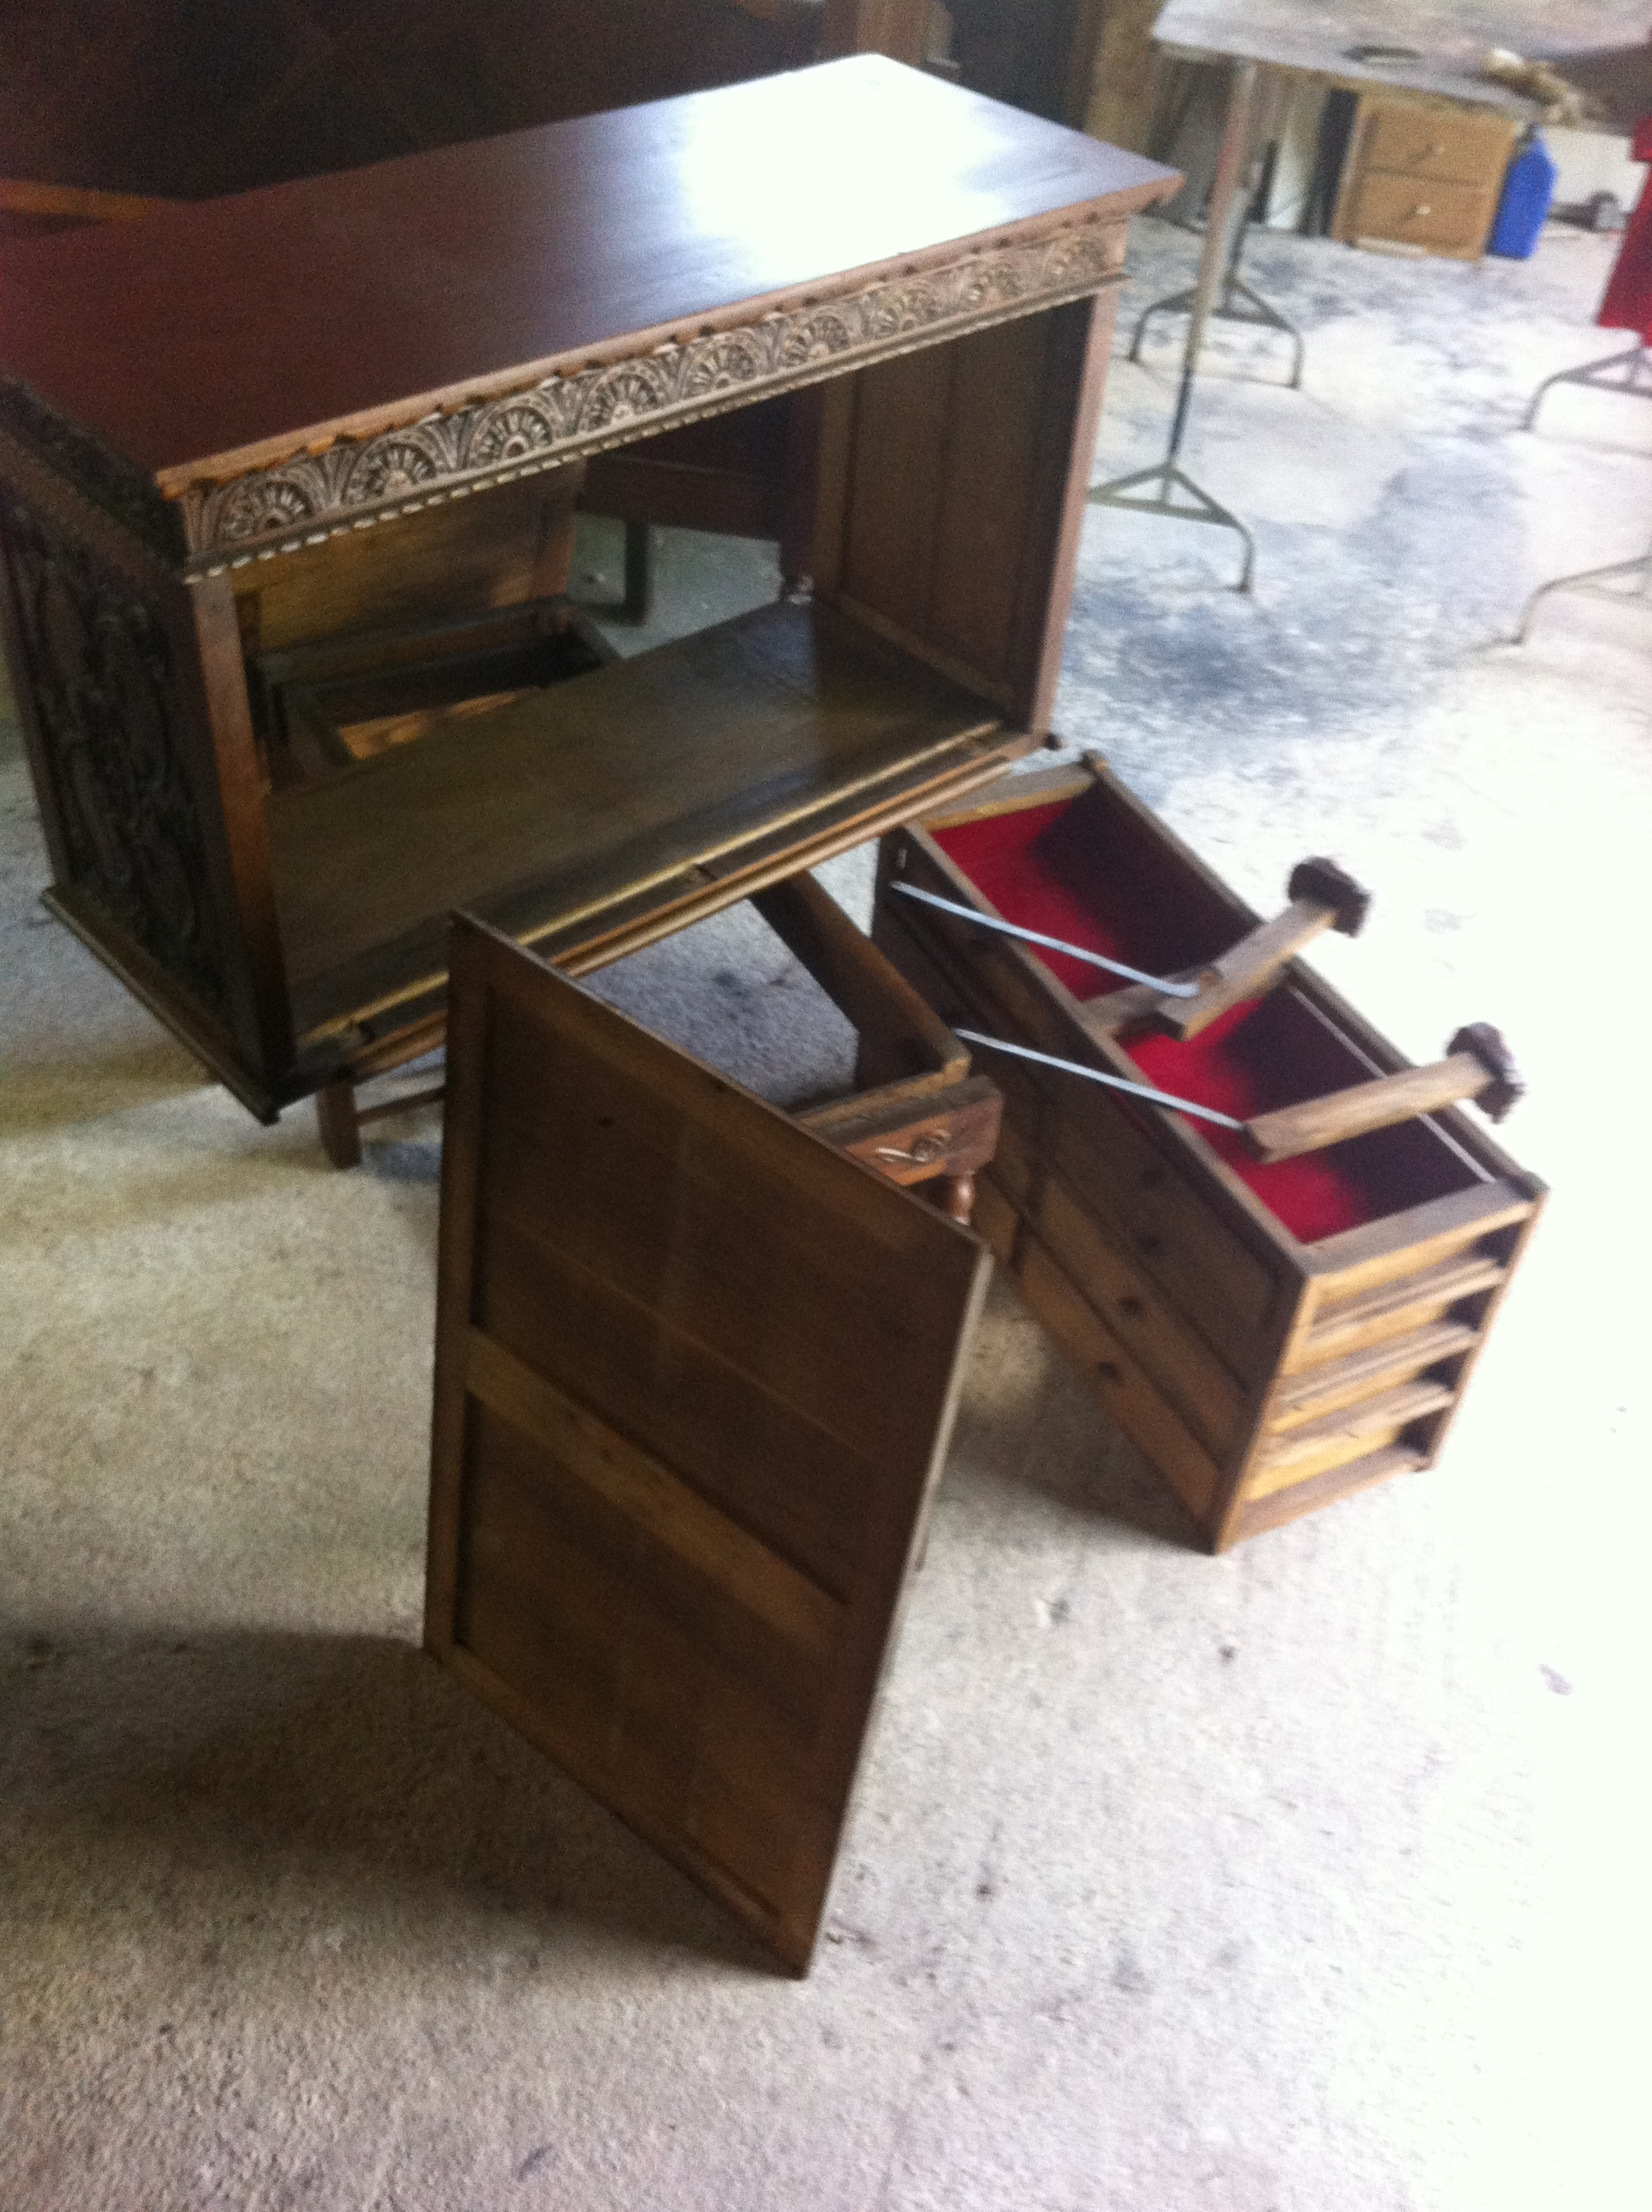 Galeria de trabajos restauracion de muebles asturias for Muebles antiguos asturias